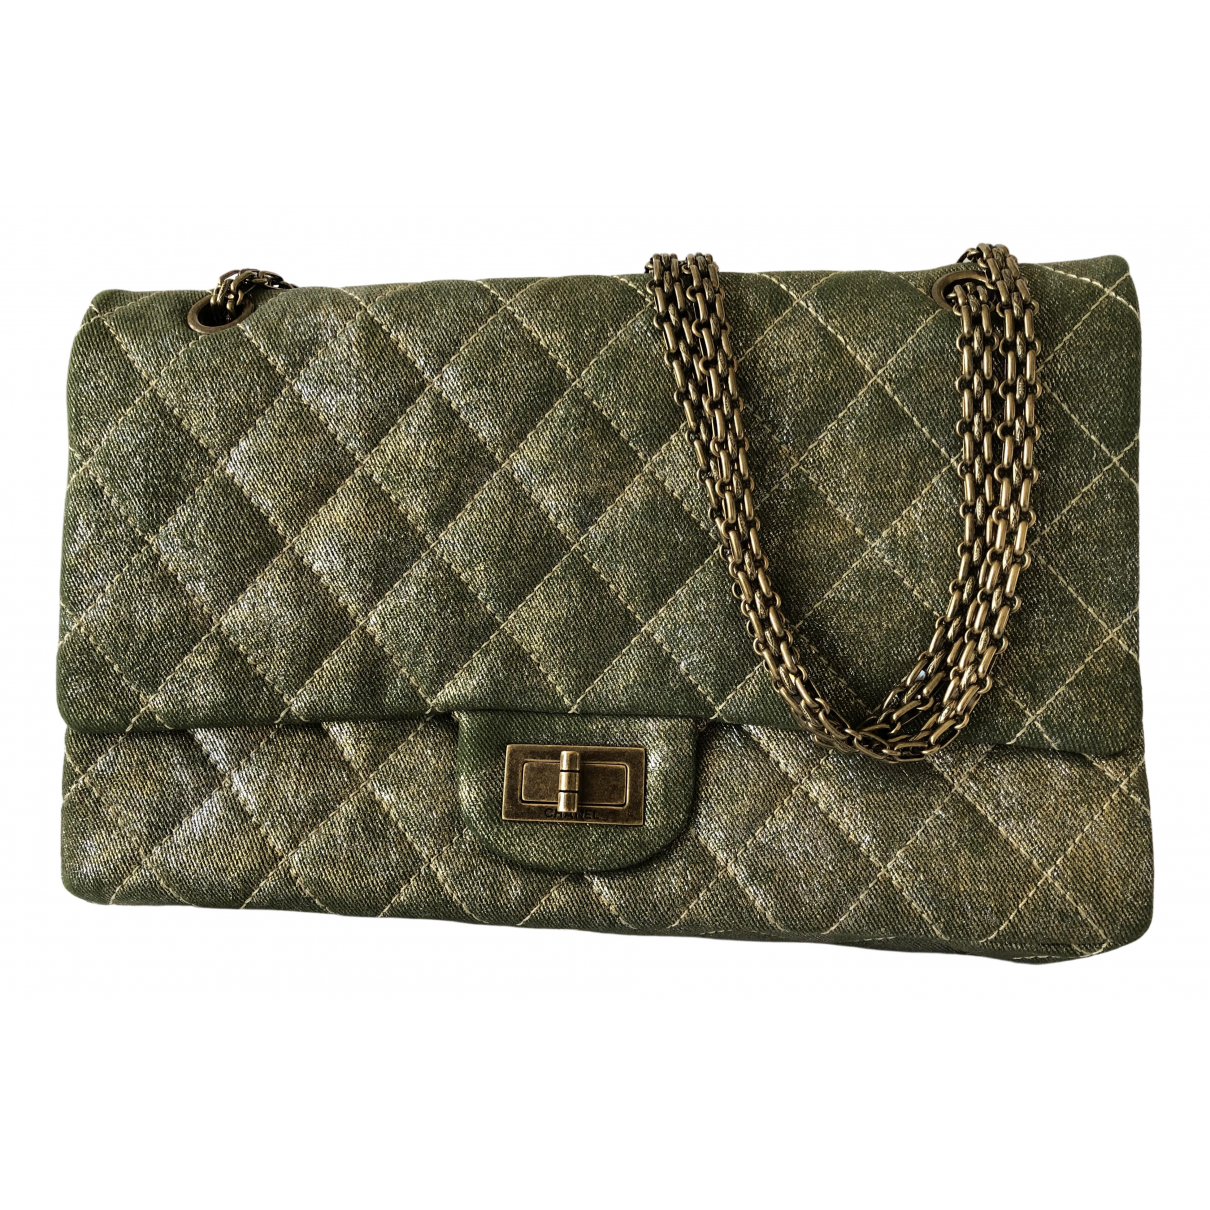 Chanel 2.55 Green Cloth handbag for Women \N